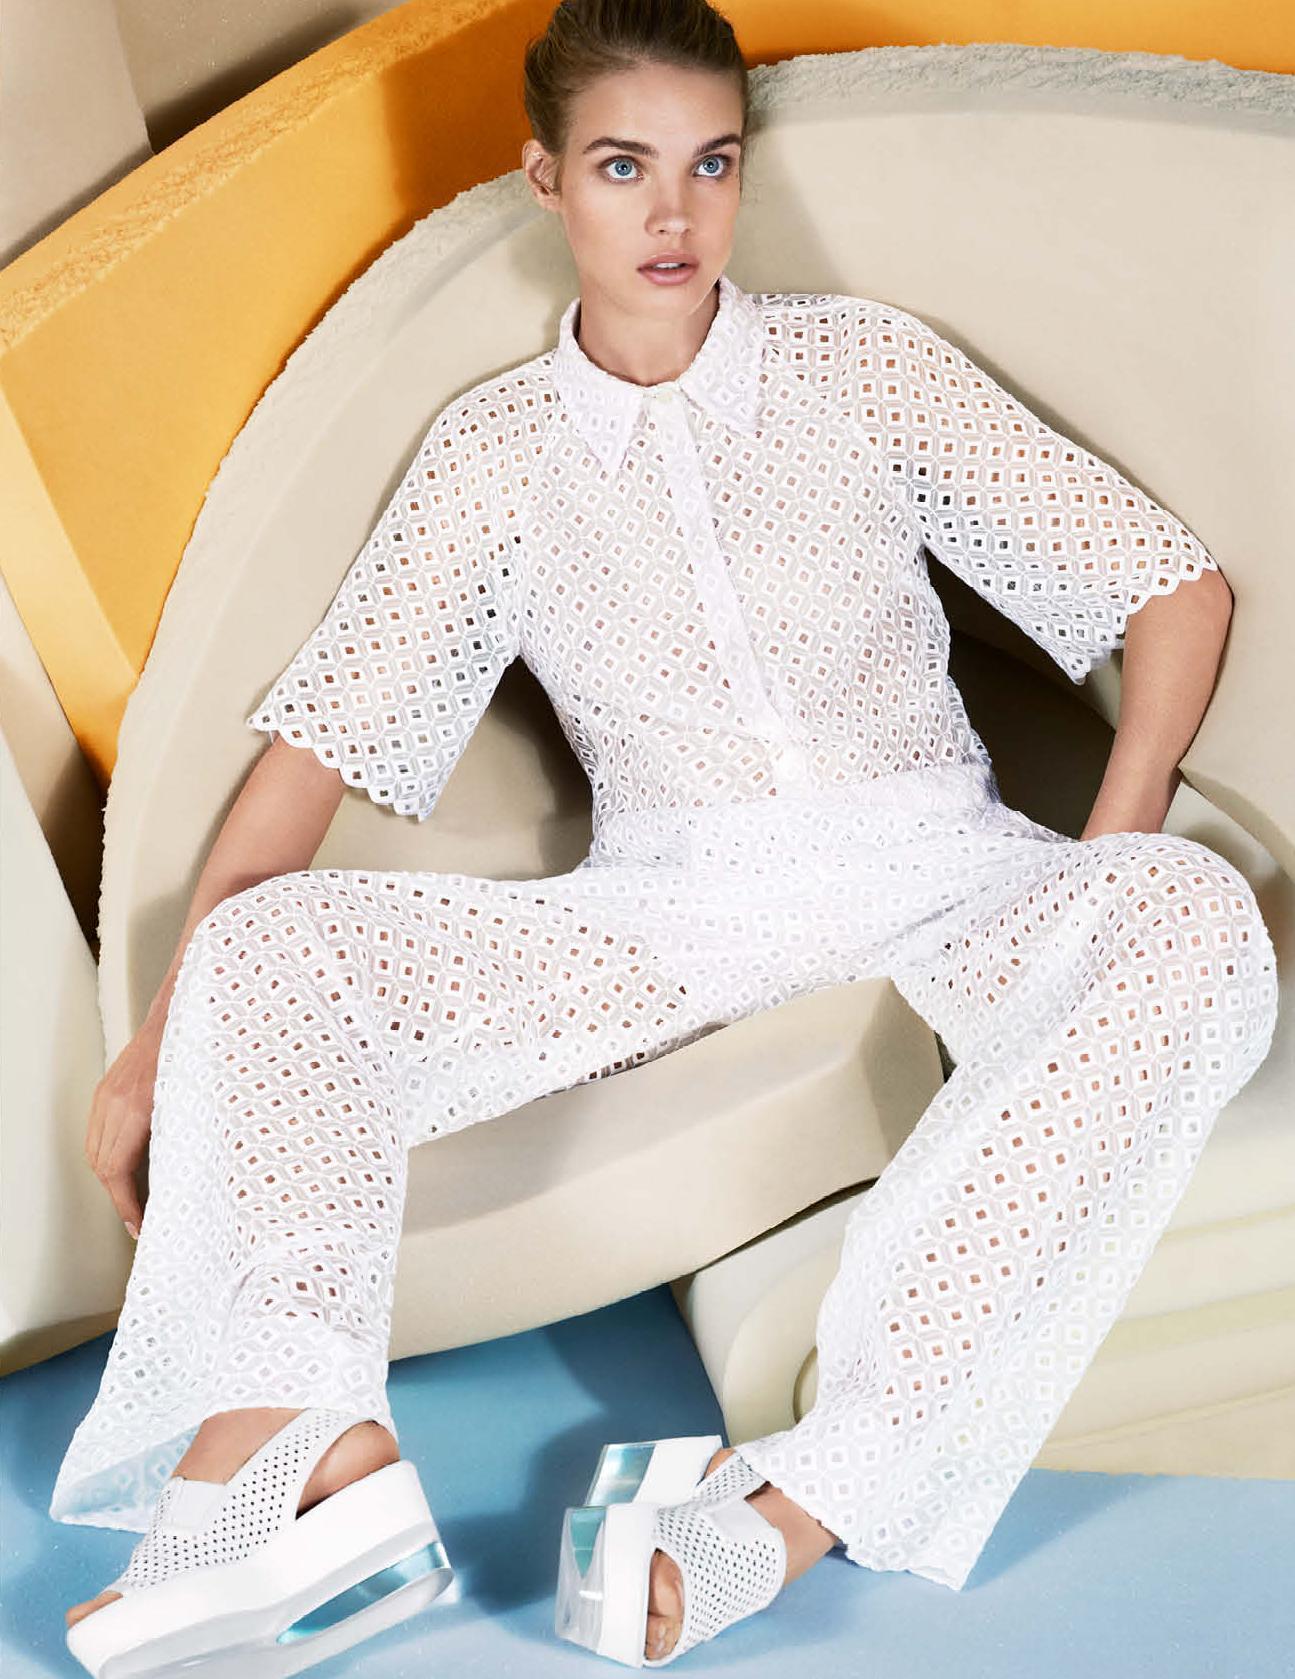 Natalia Vodianova By Paolo Roversi For Vogue Russia: Natalia Vodianova's Feet